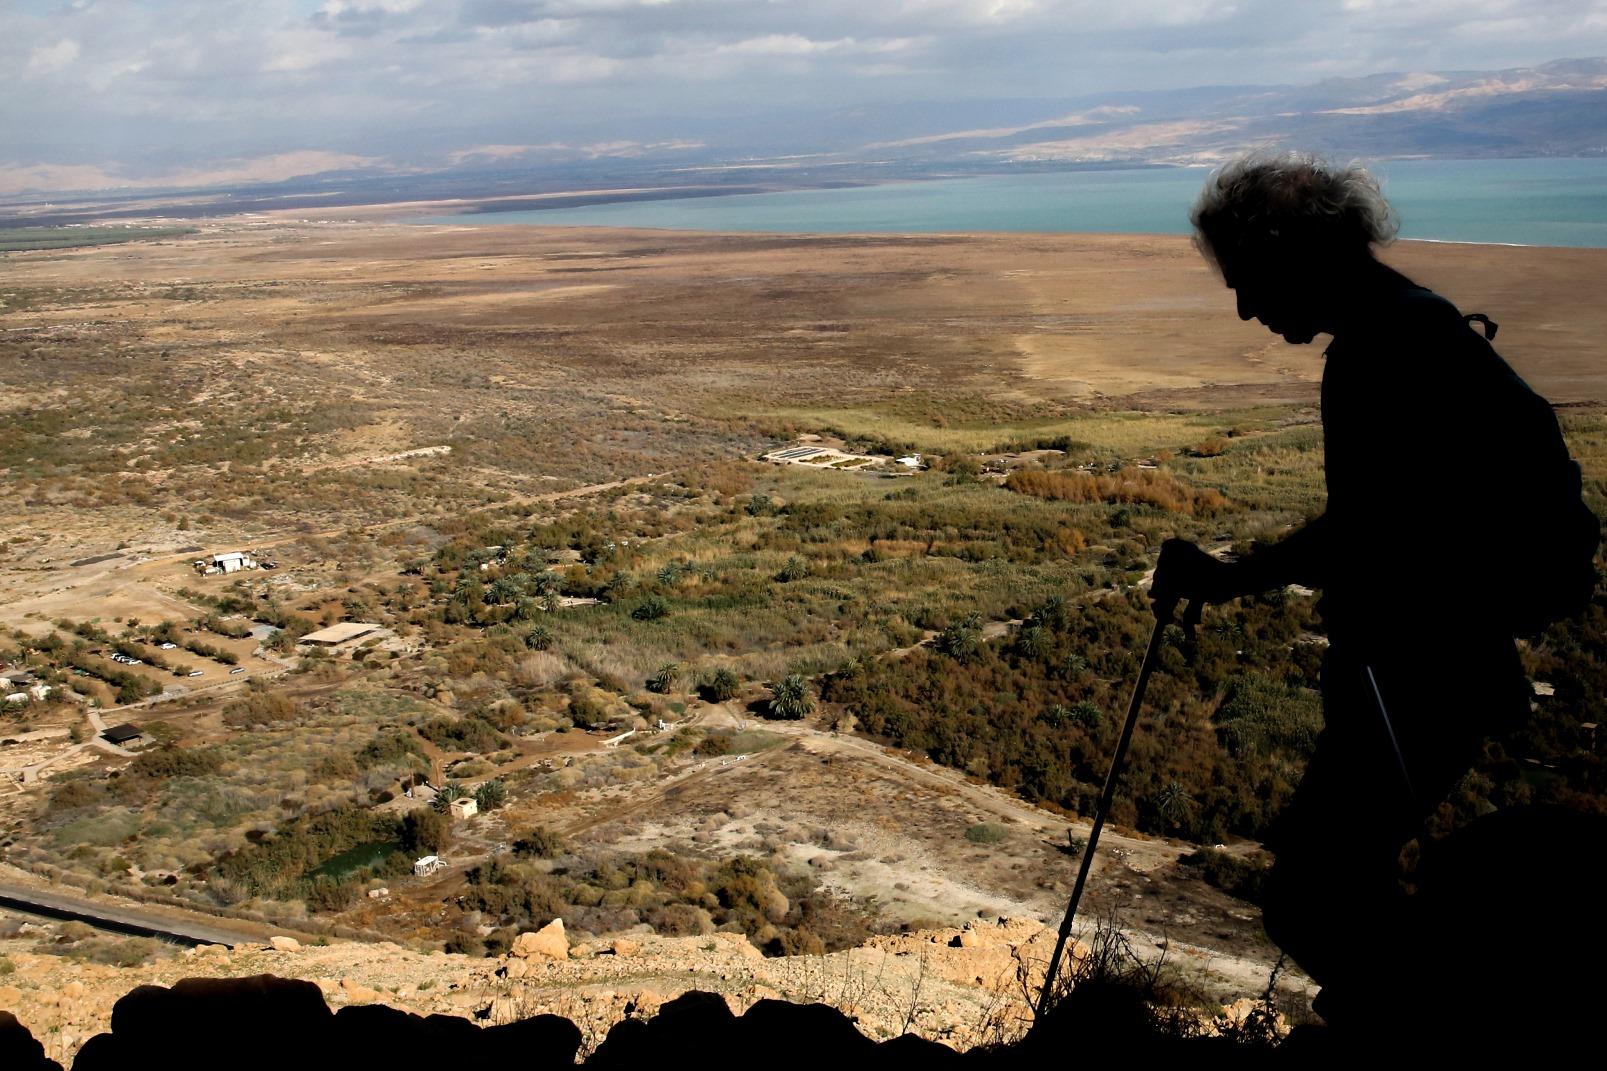 A hiker above Ein Feshkha (Einot Tzukim) in the Dead Sea region. Photo by Yossi Zamir/FLASH90